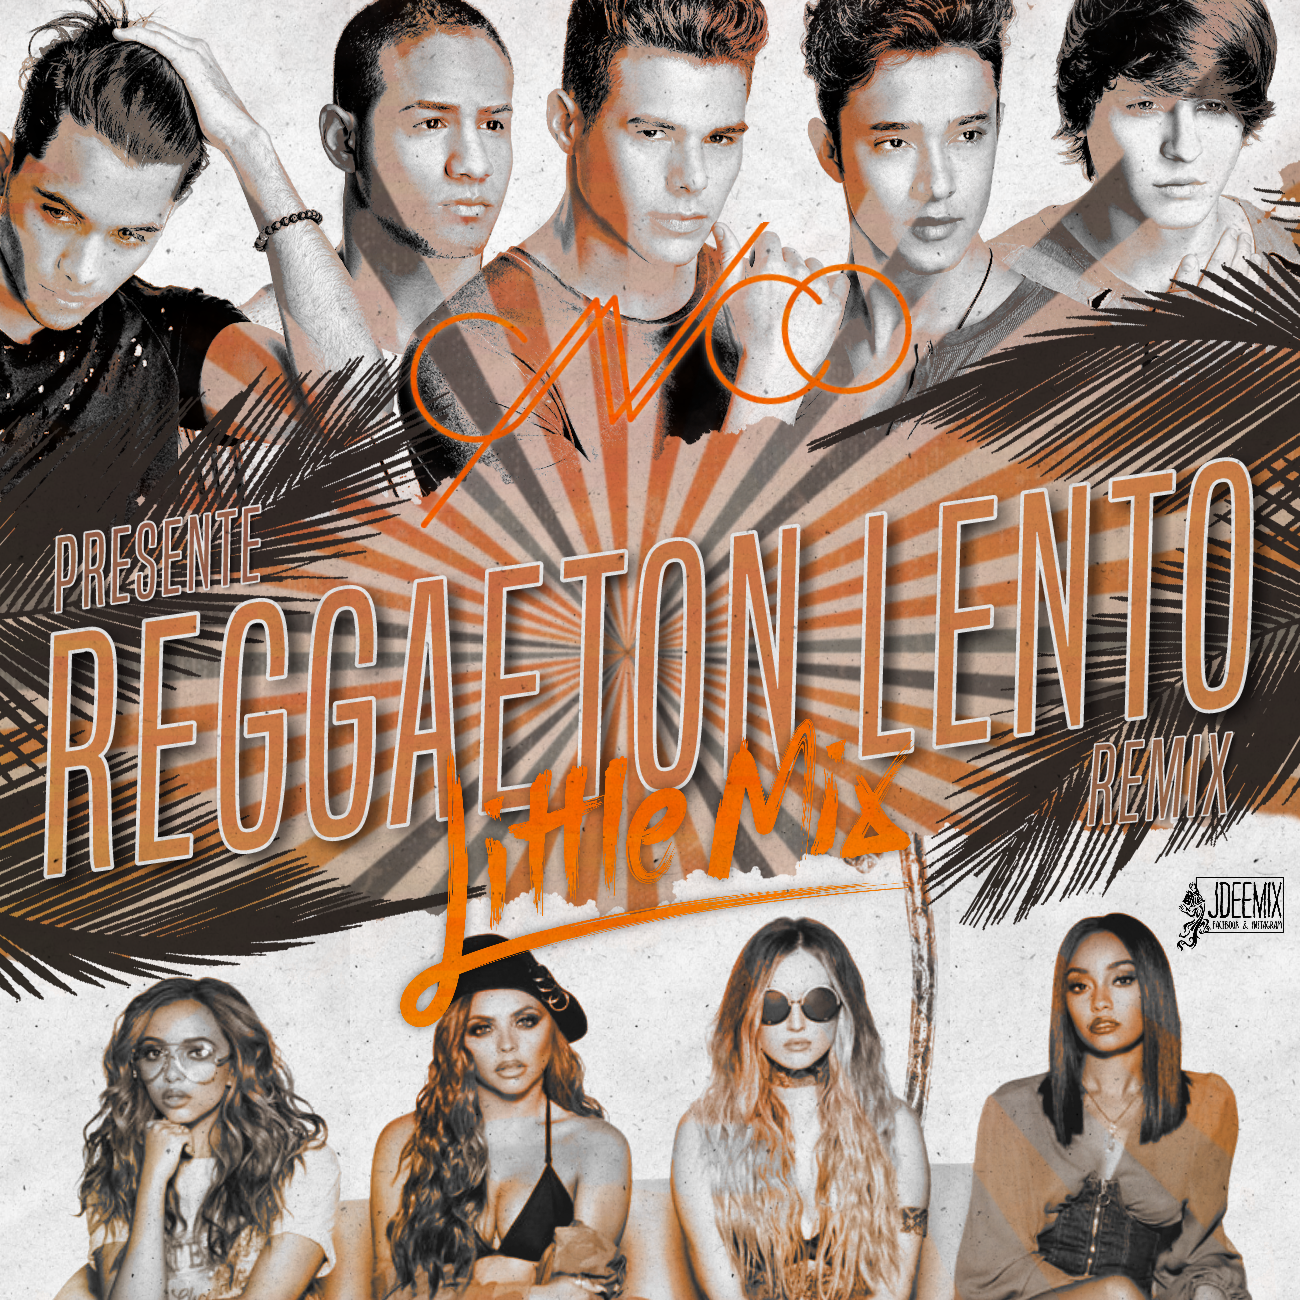 CNCO / Little Mix - Reggaeton Lento